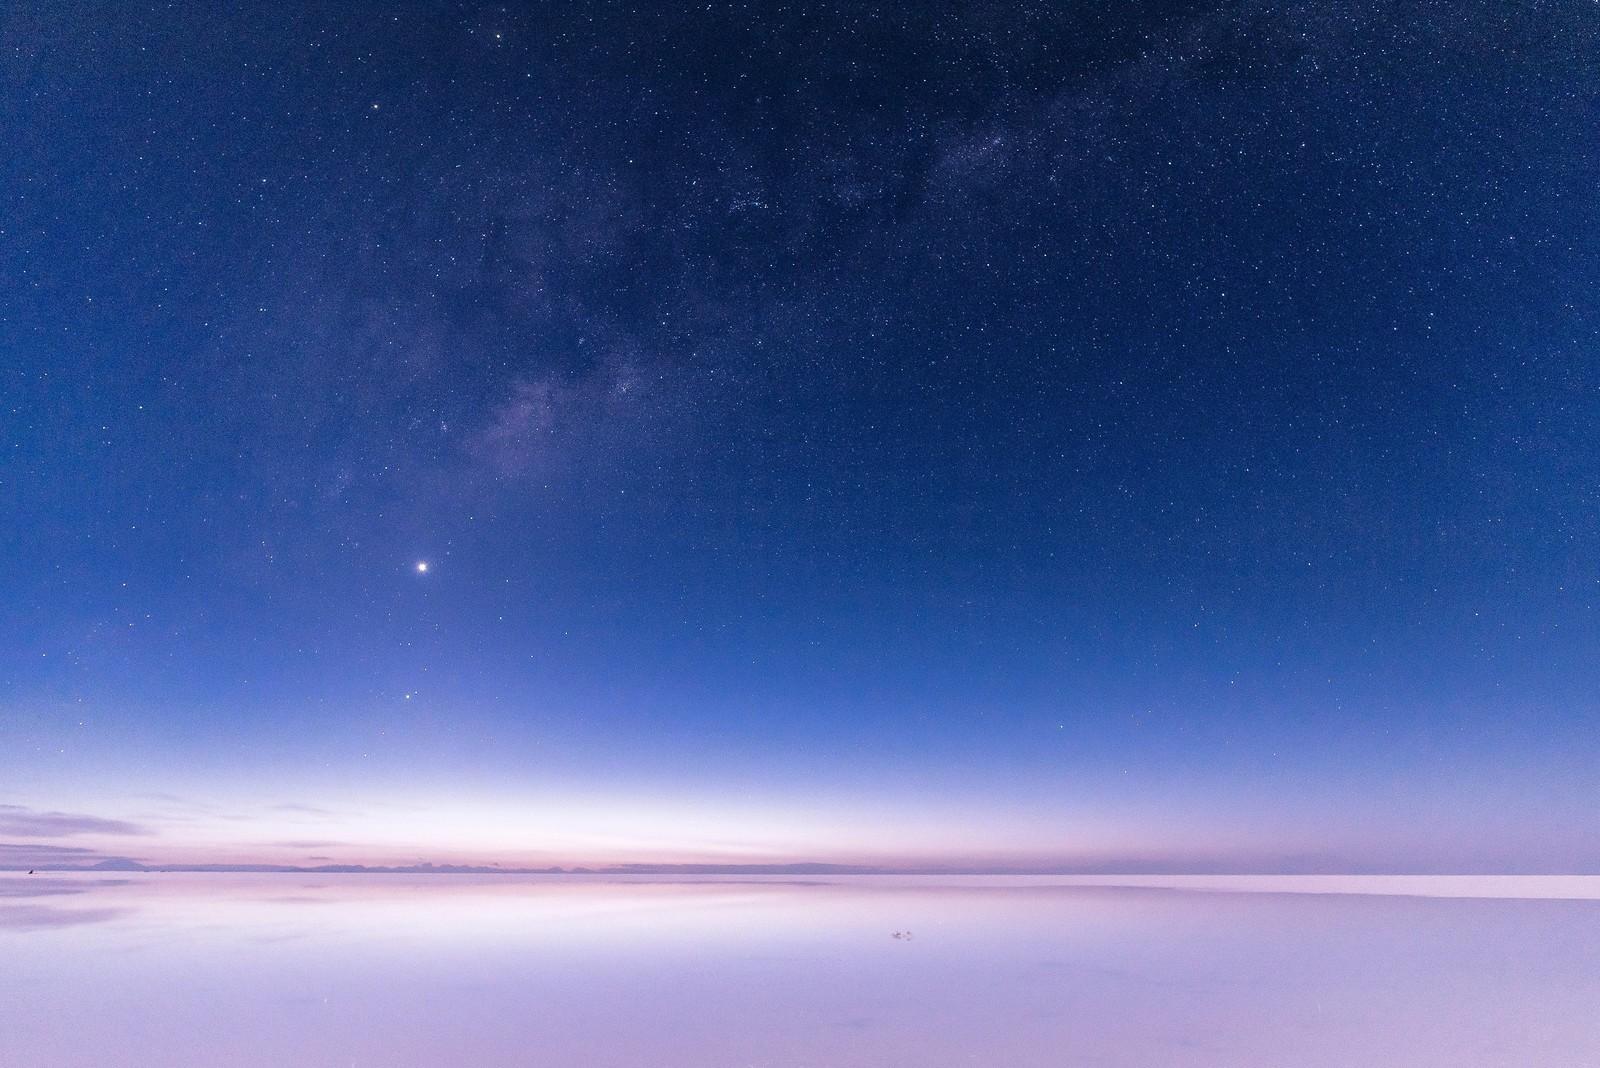 f:id:planetplants:20181230061631j:image